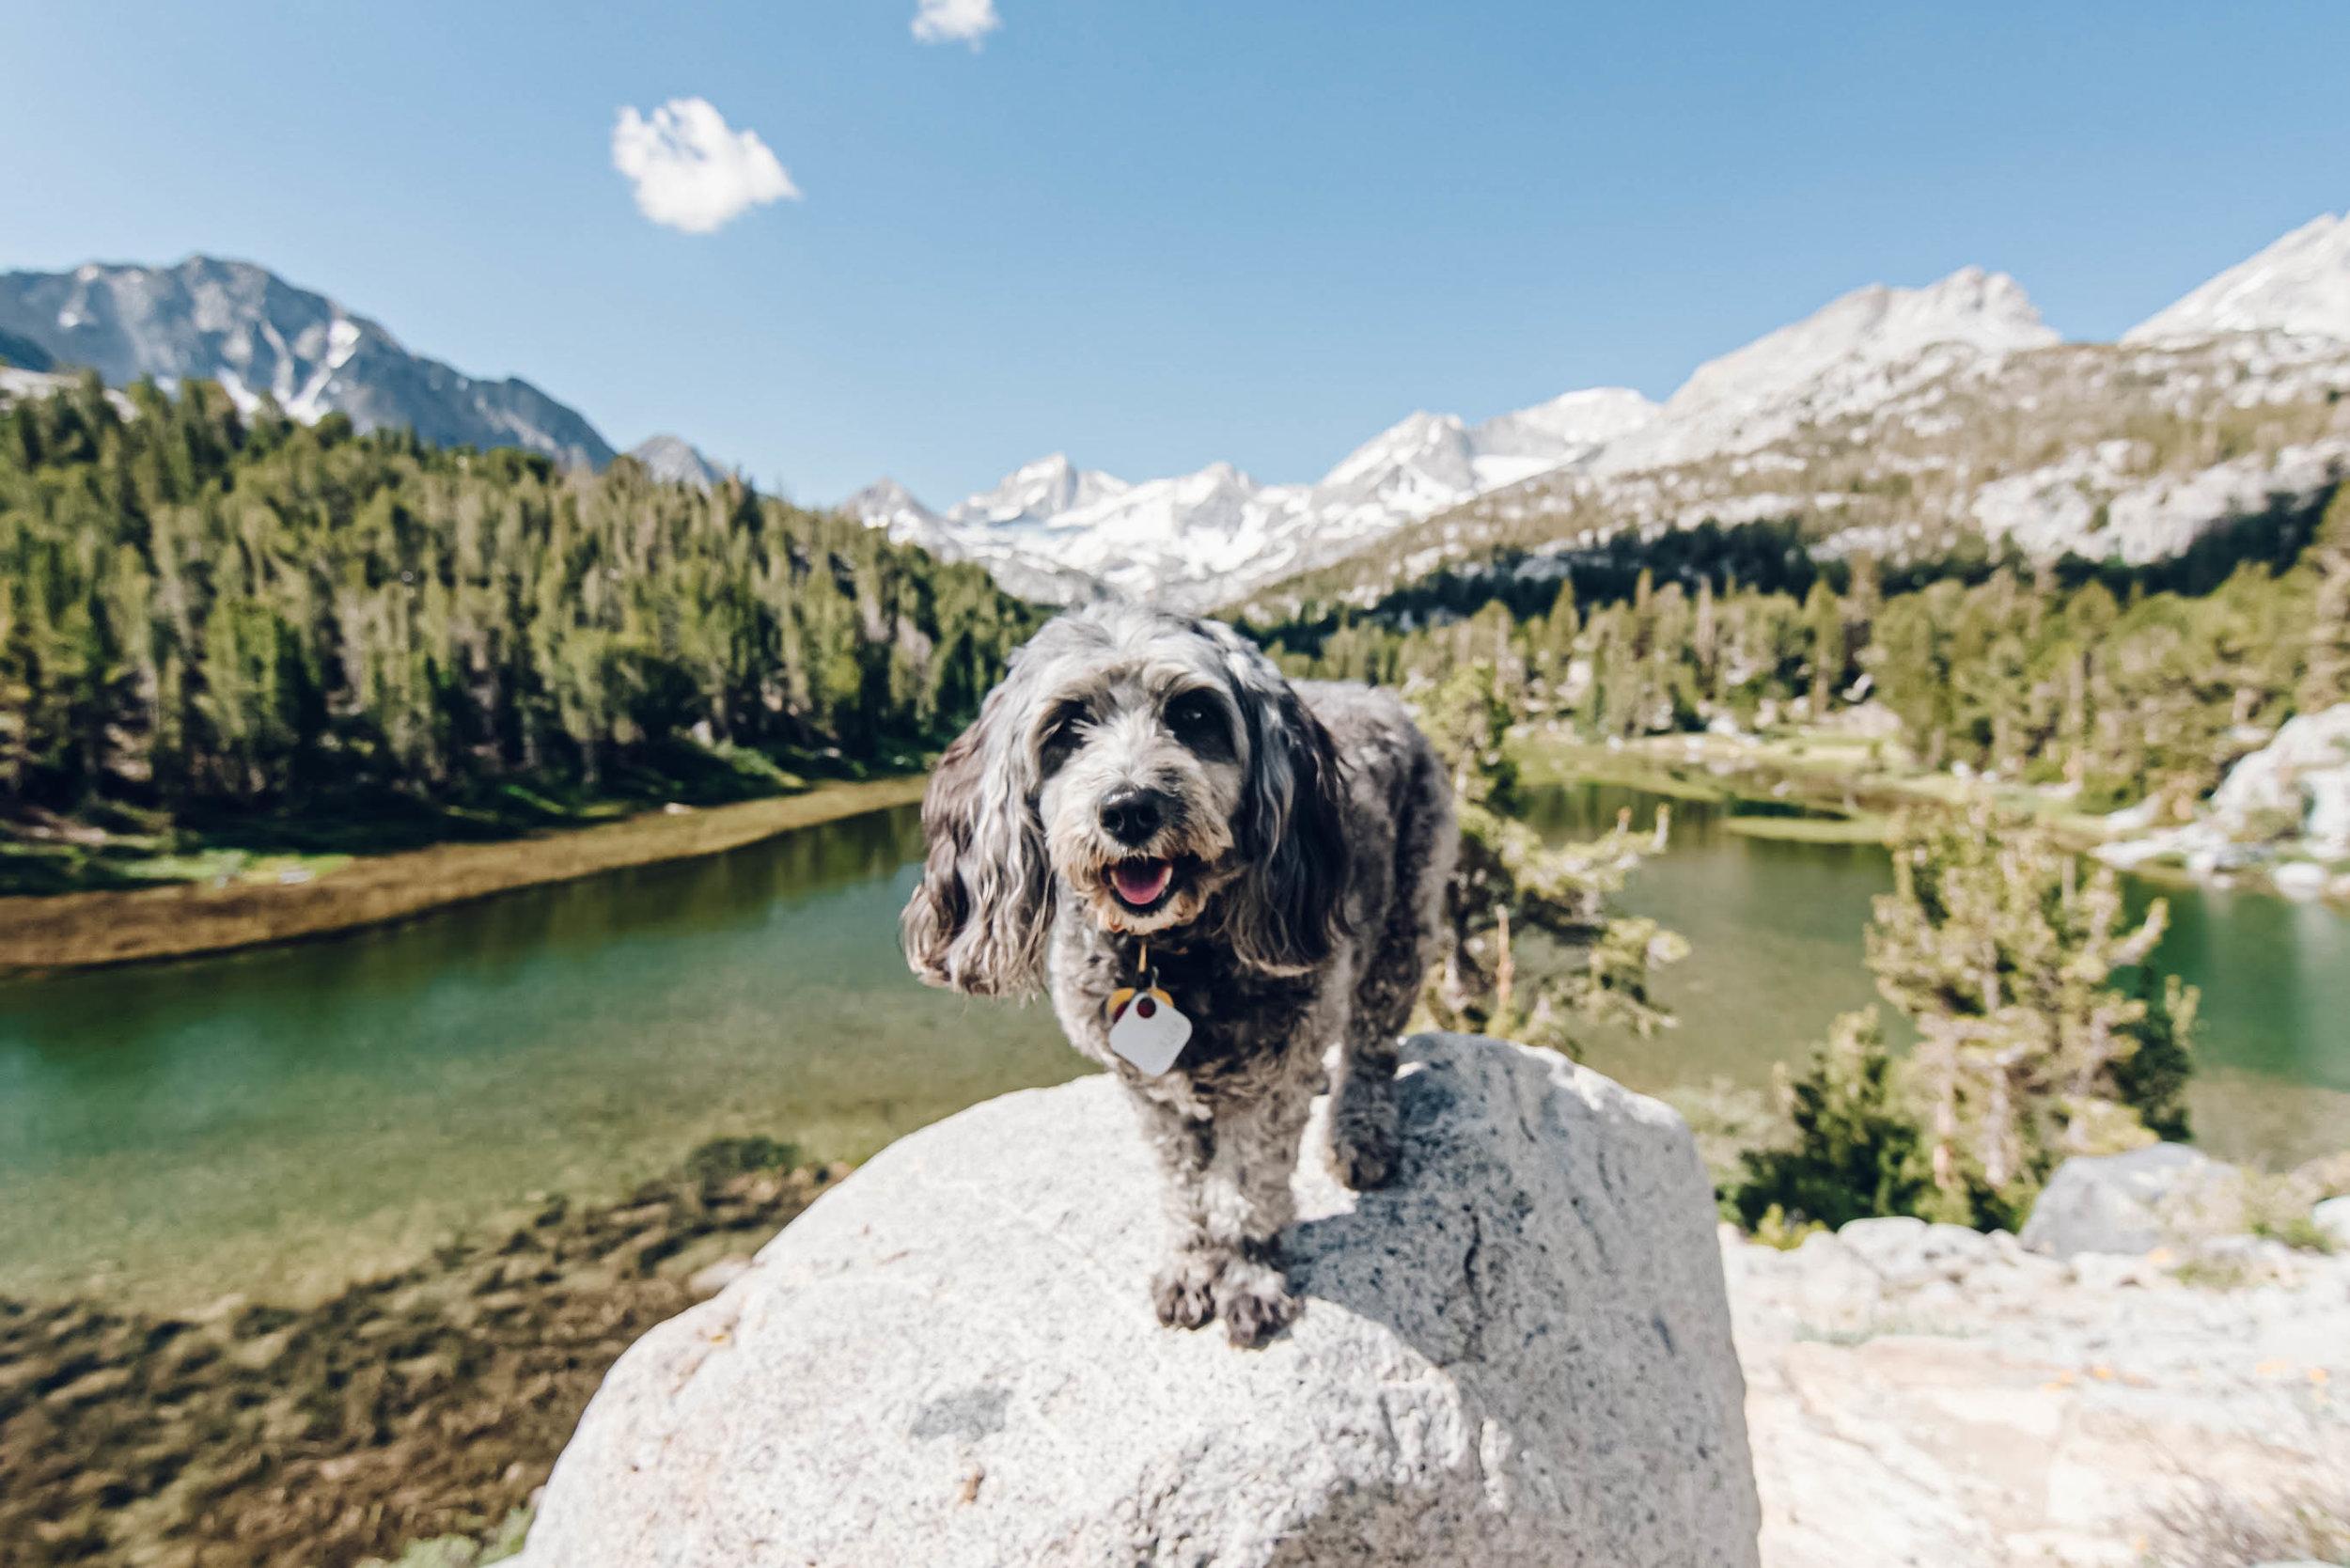 Dog in mountains.jpg